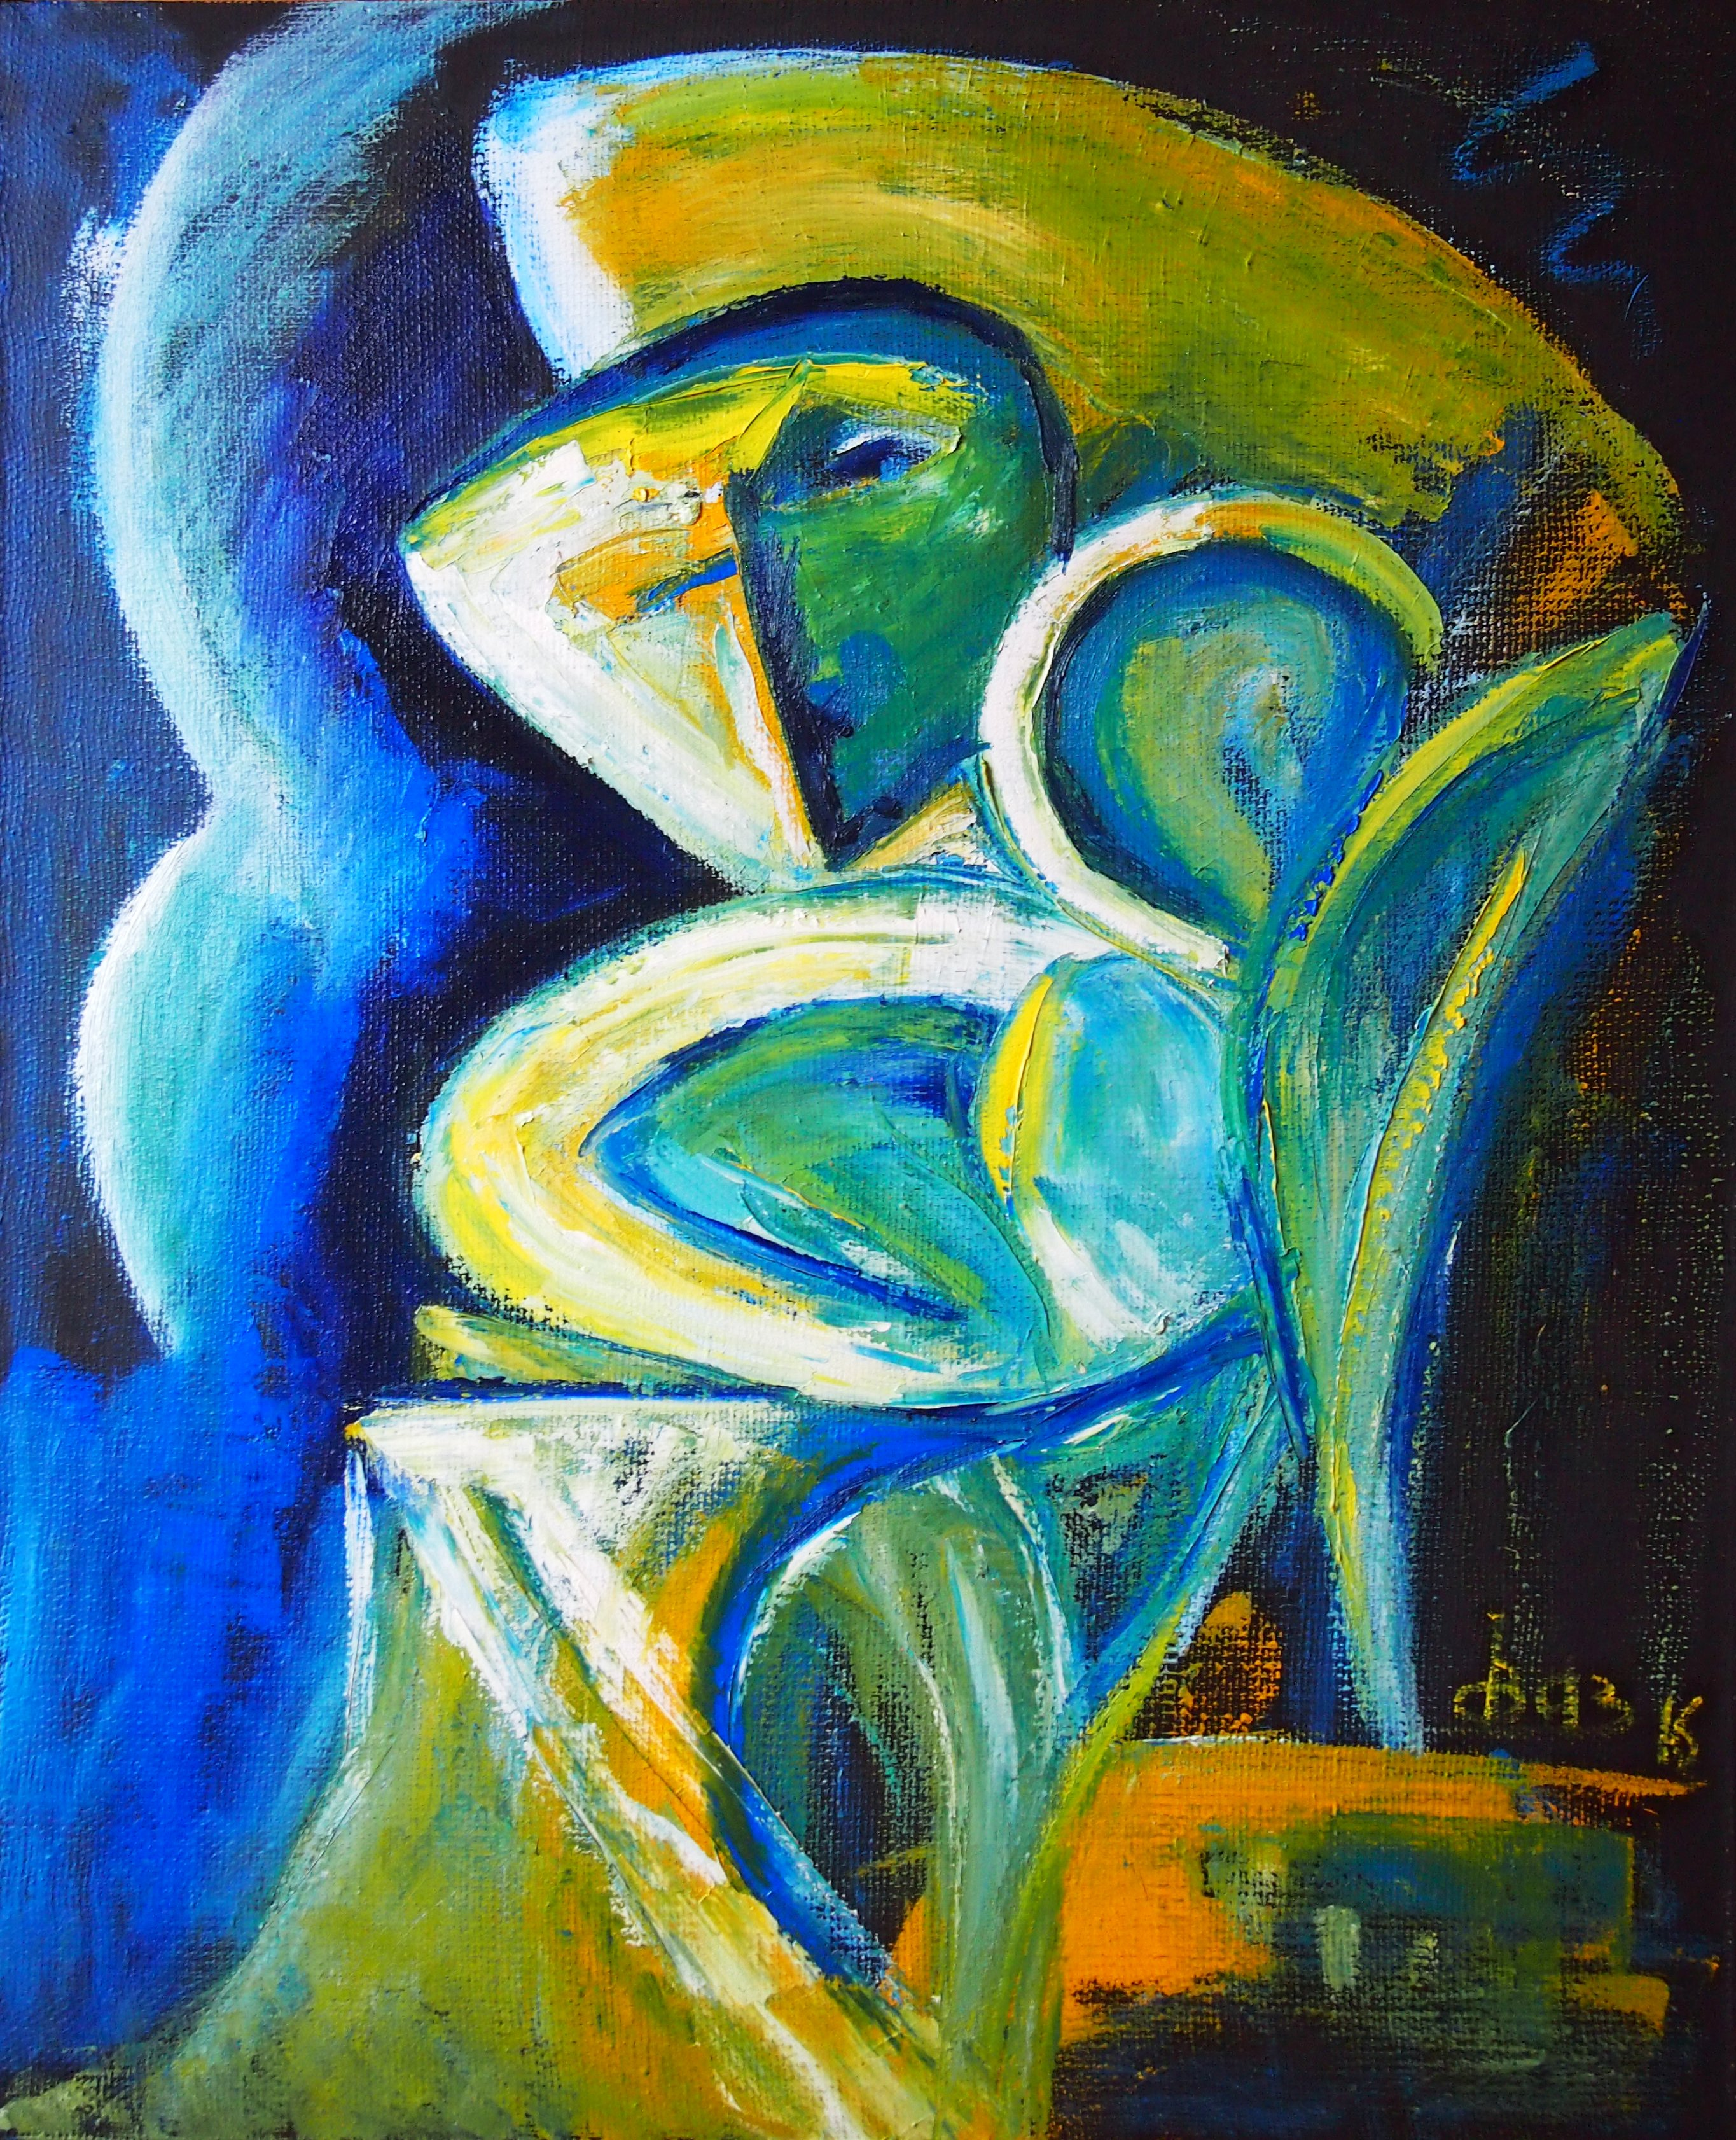 Untitled (Cosmic)